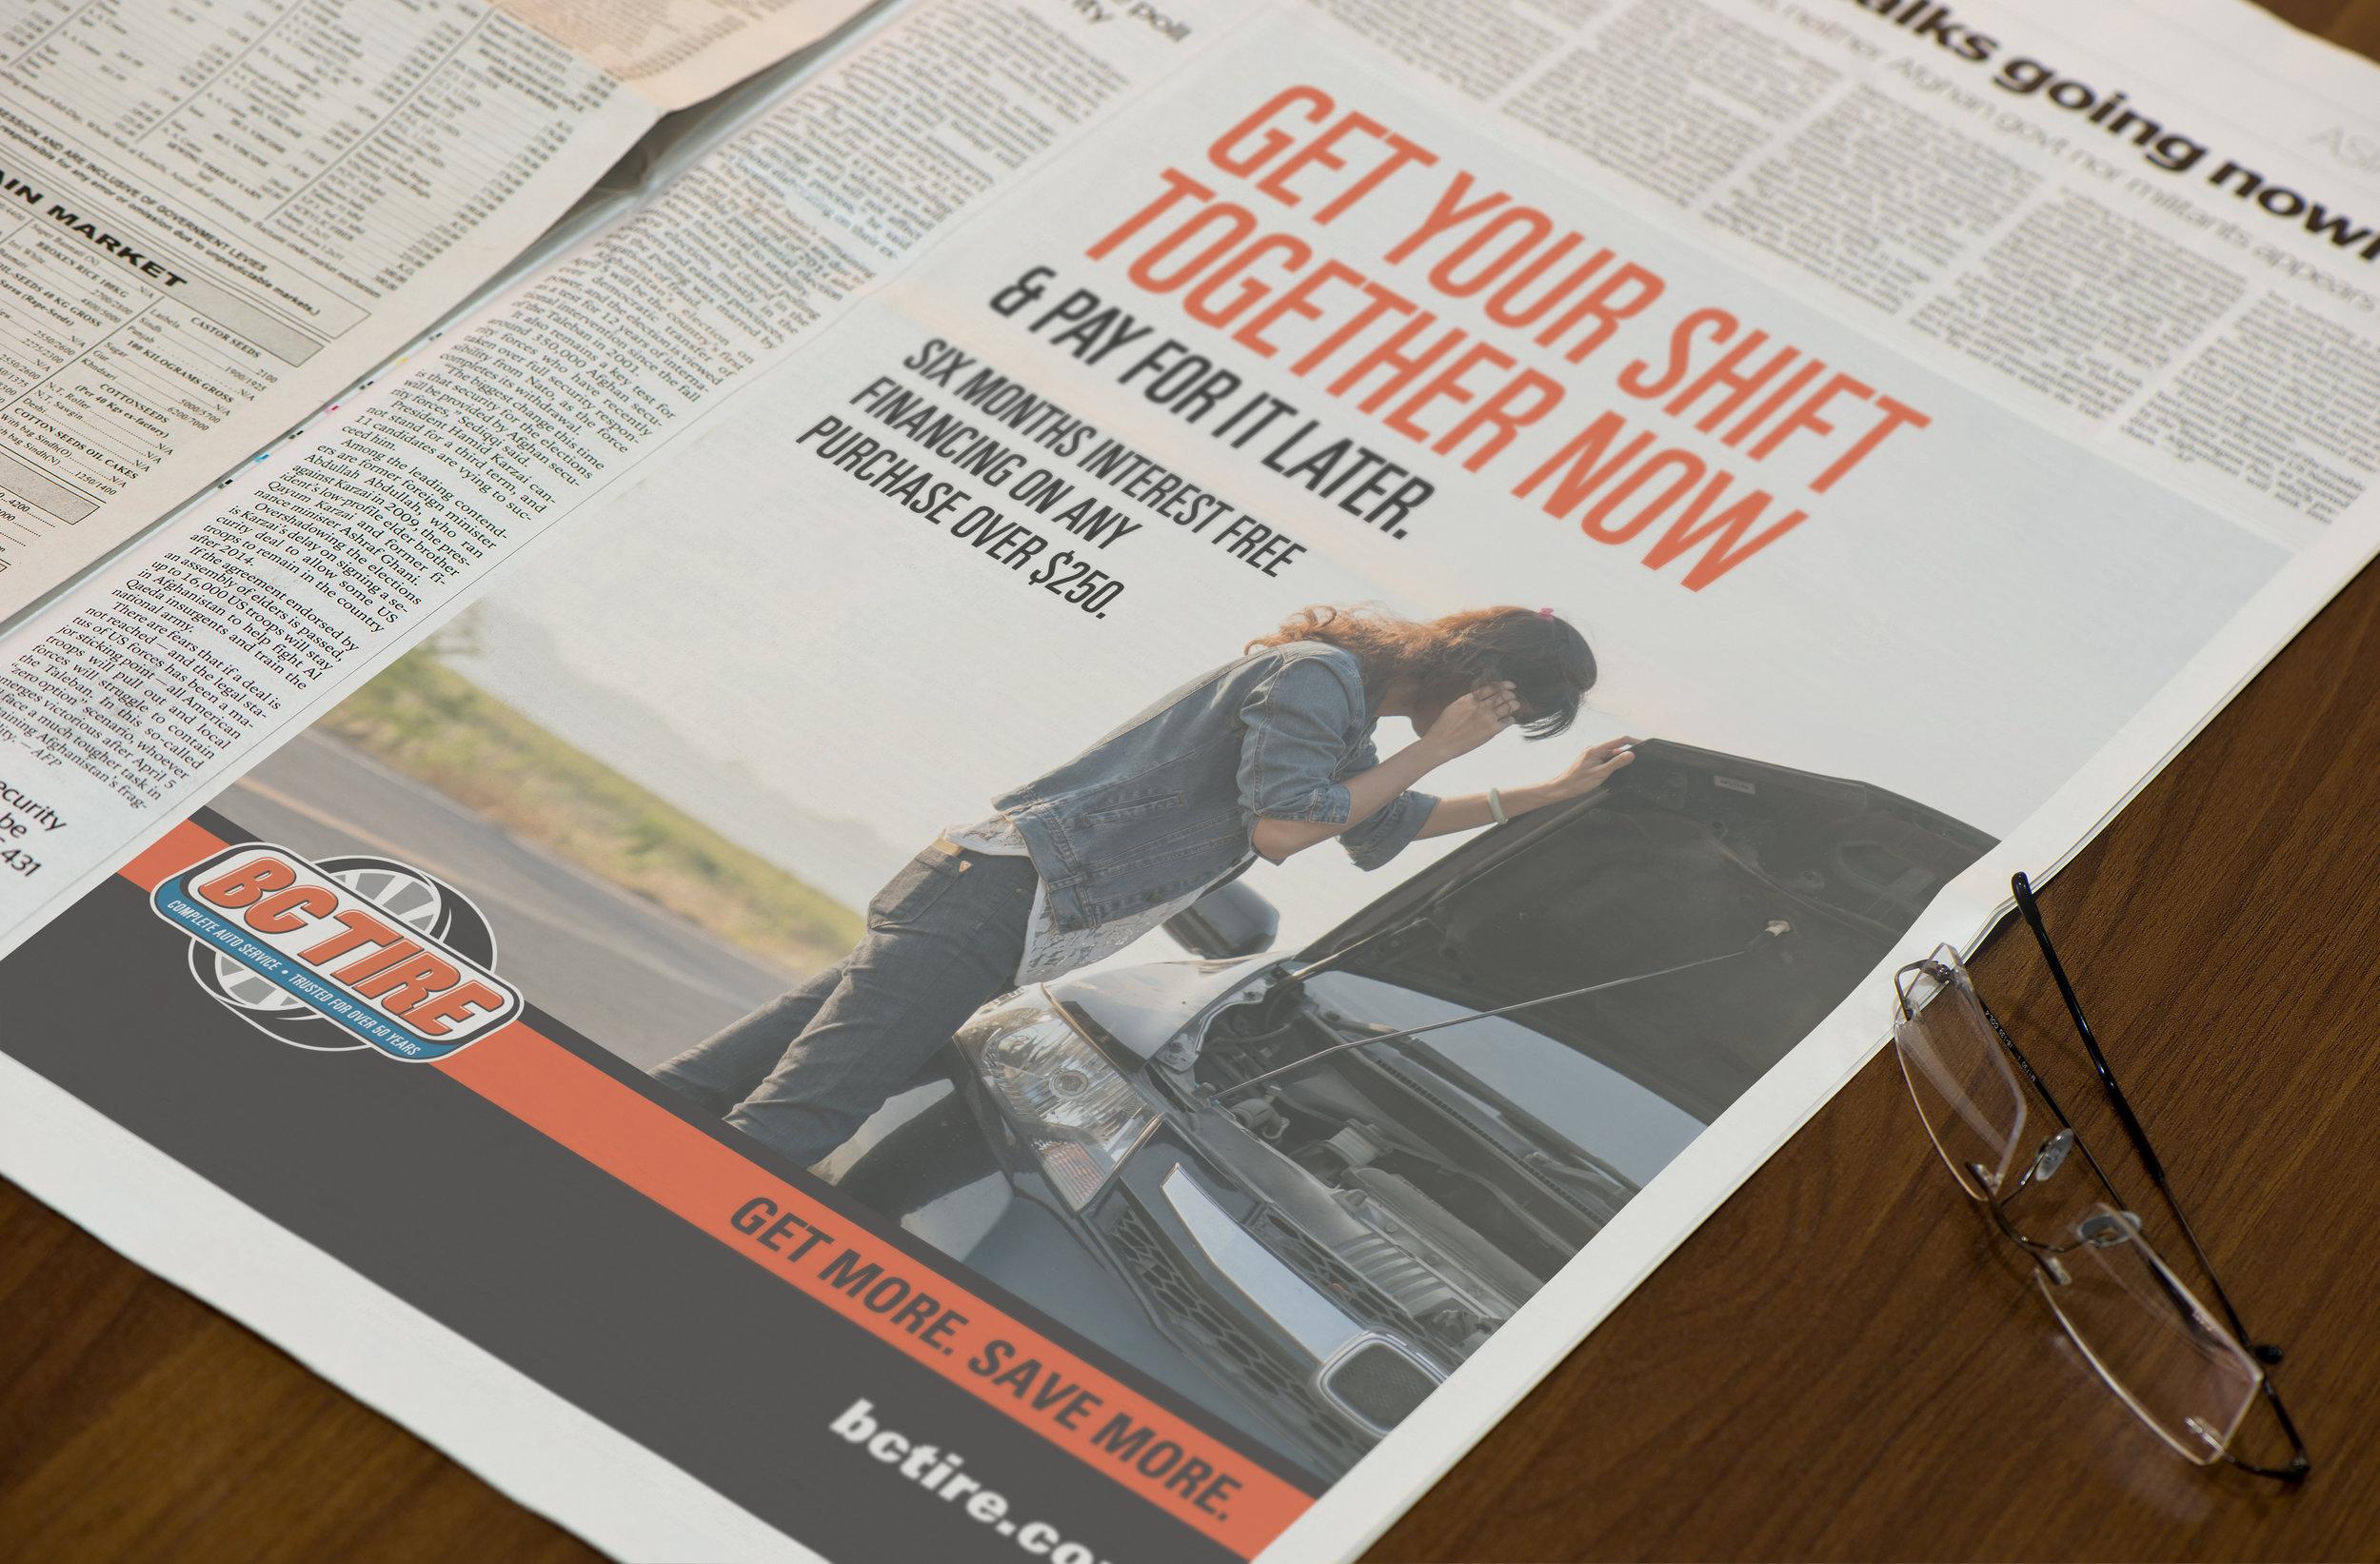 grass-creative-branding-logo-design-bctire-NYC-NJ-newspaper-ad.jpg